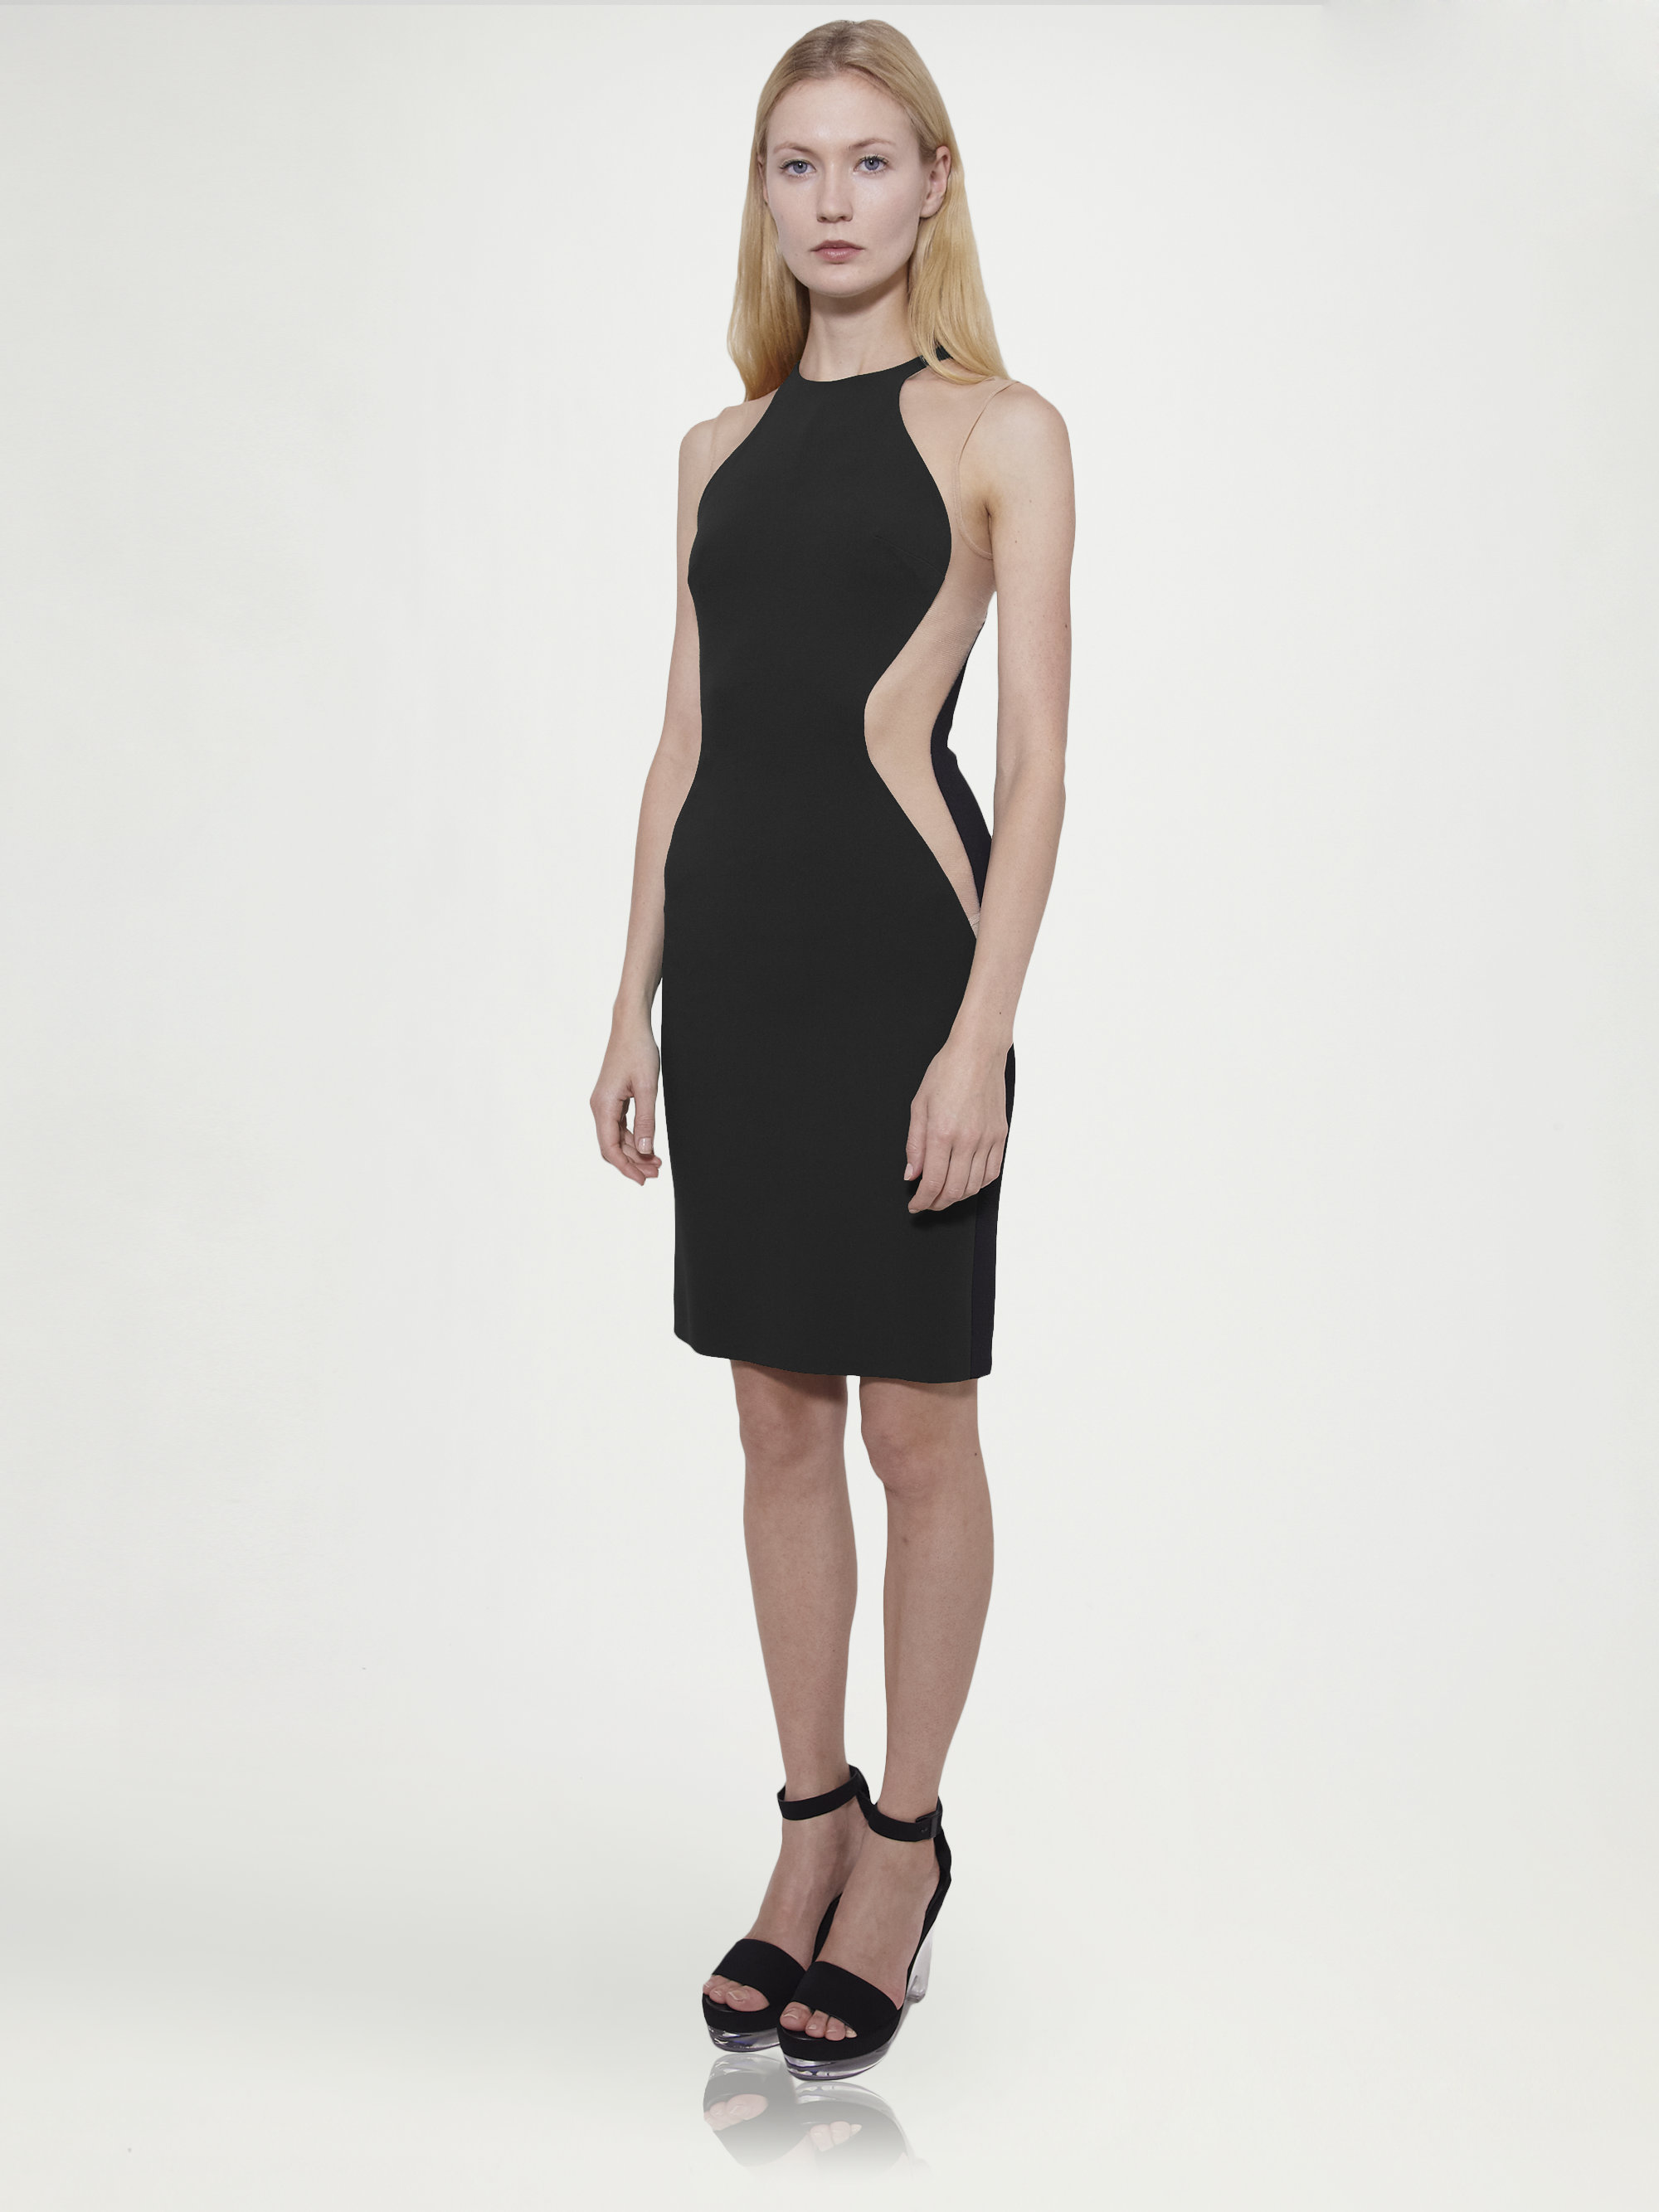 Mccartney Stella Saks Dress